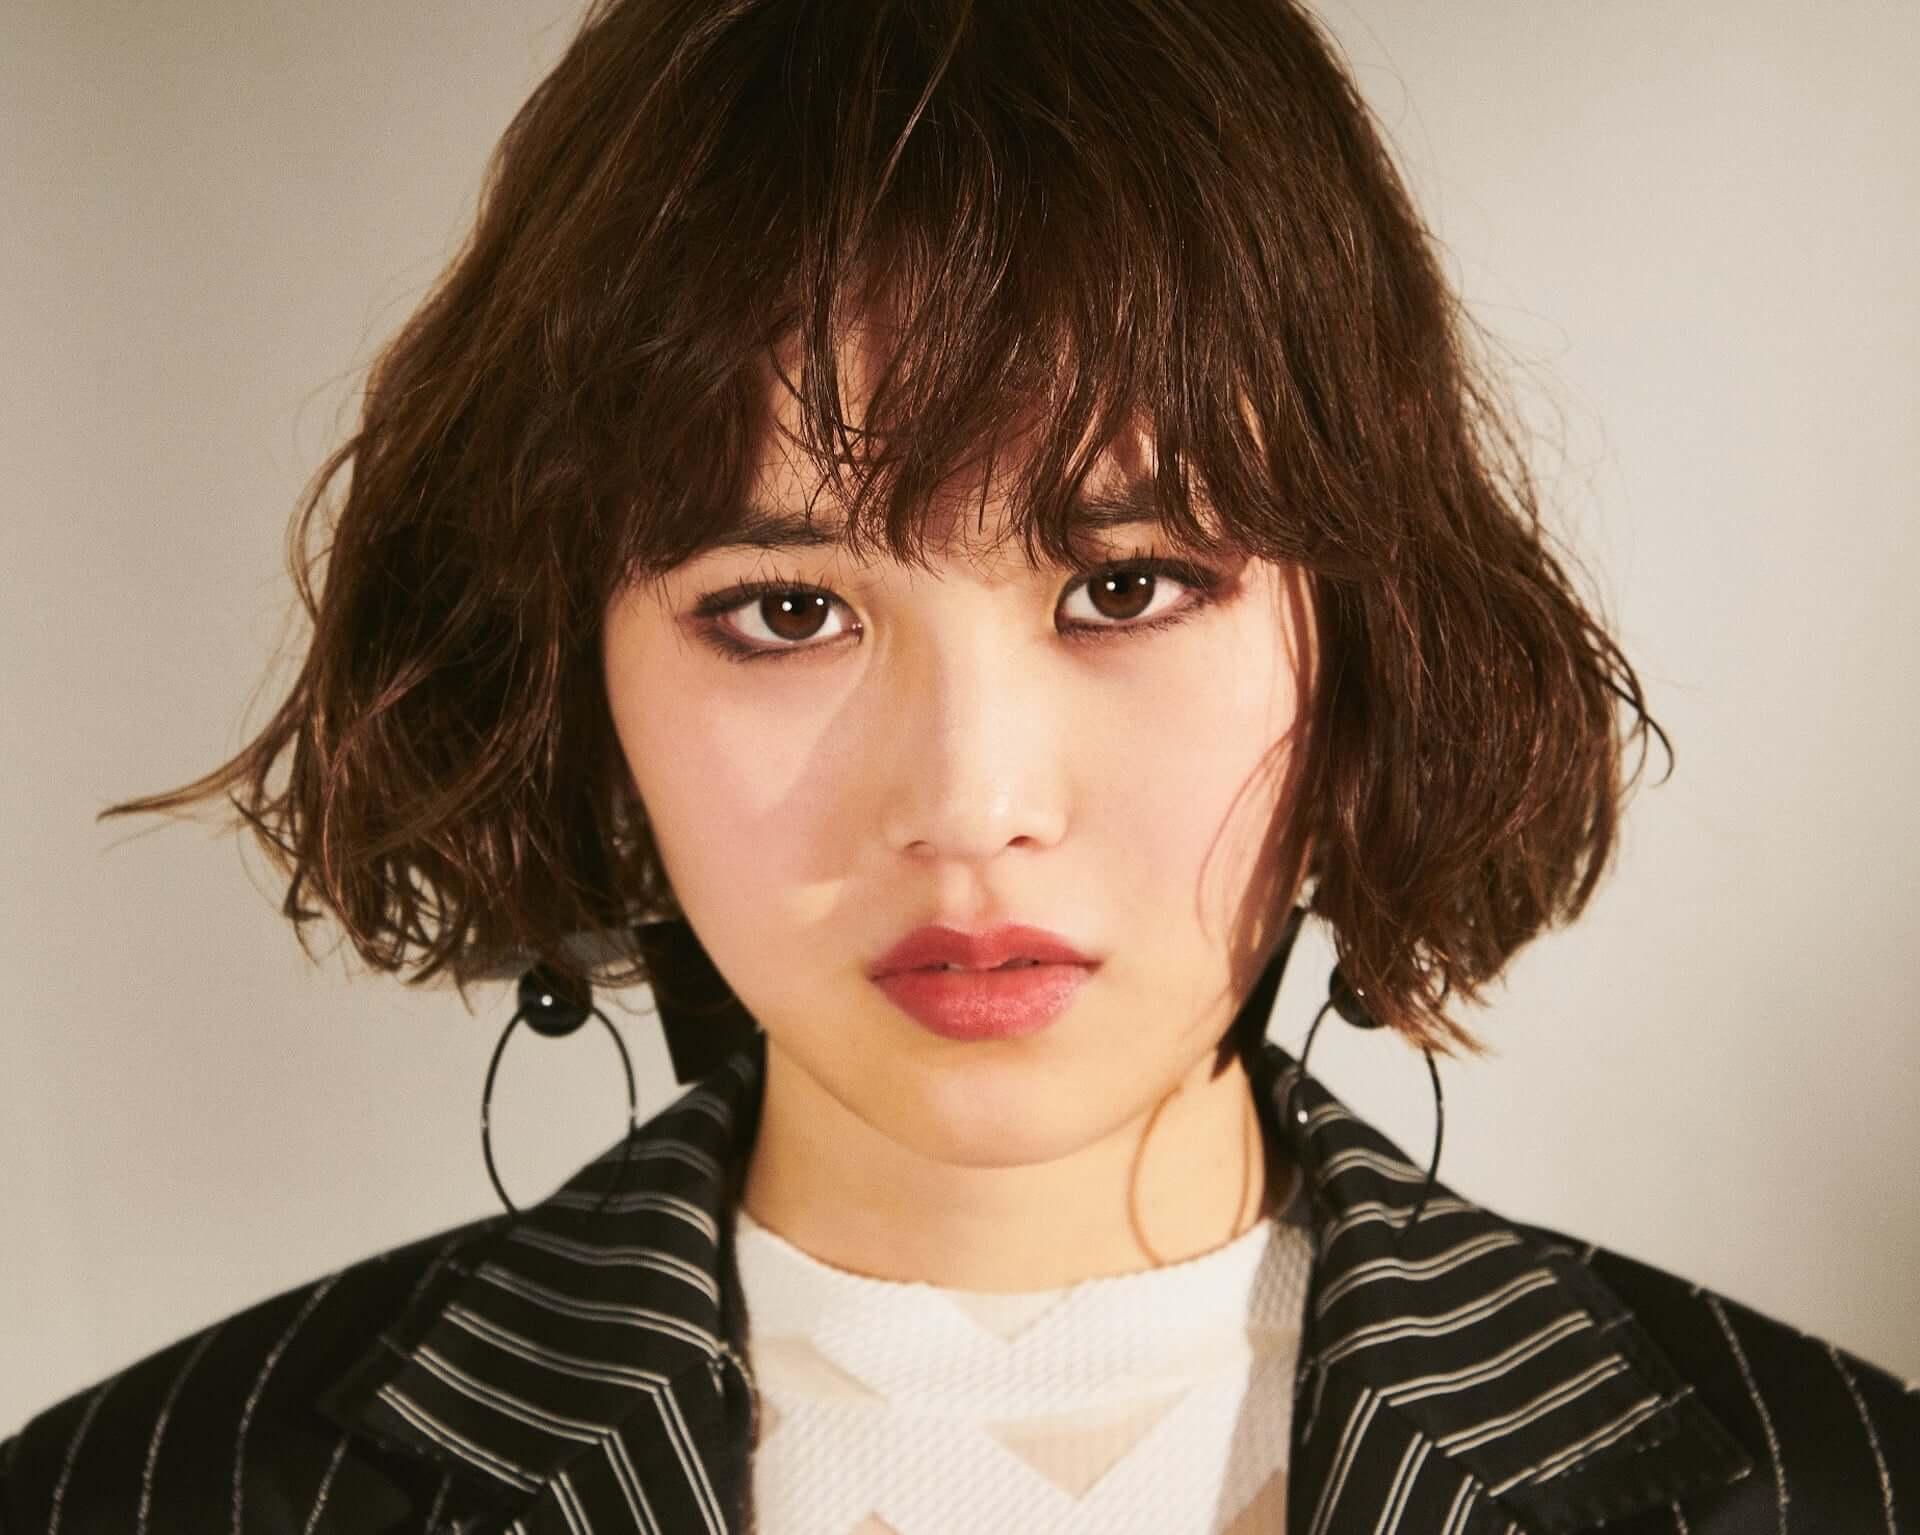 "Reiの2ndアルバム『HONEY』が発売決定!SOIL&""PIMP""SESSIONSとのコラボ曲も収録 music201009_rei_3-1920x1535"